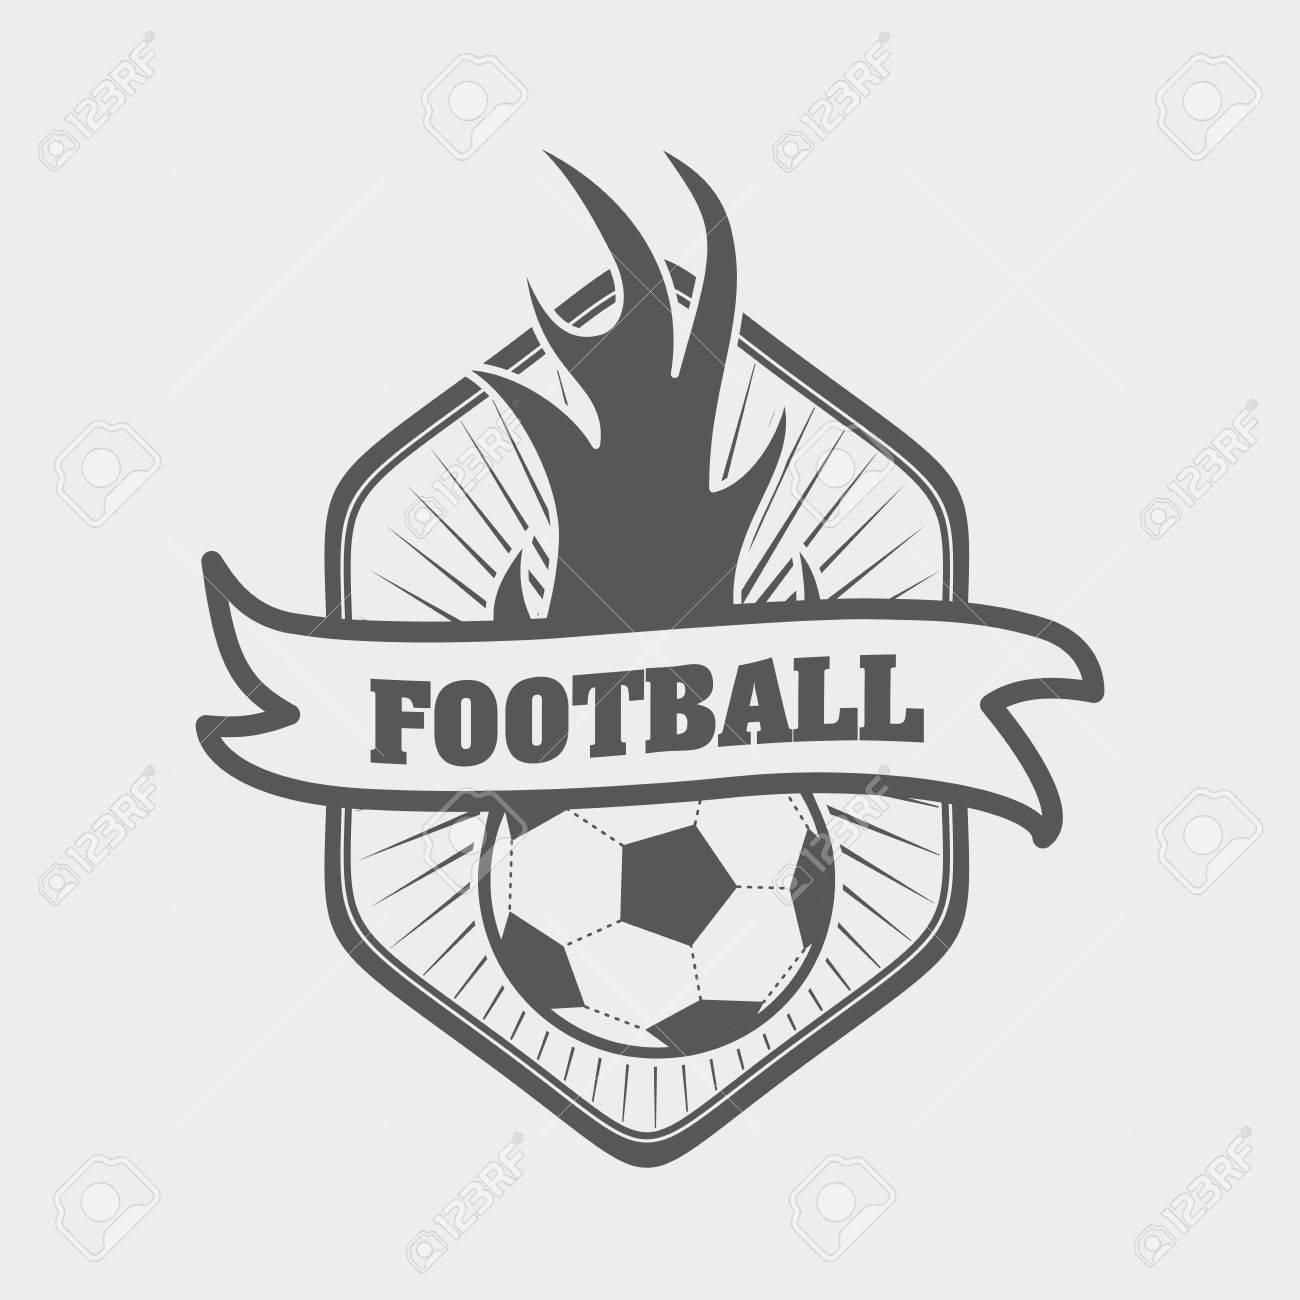 Fútbol O Fútbol, ??plantilla De Etiqueta O Tarjeta De Identificación ...